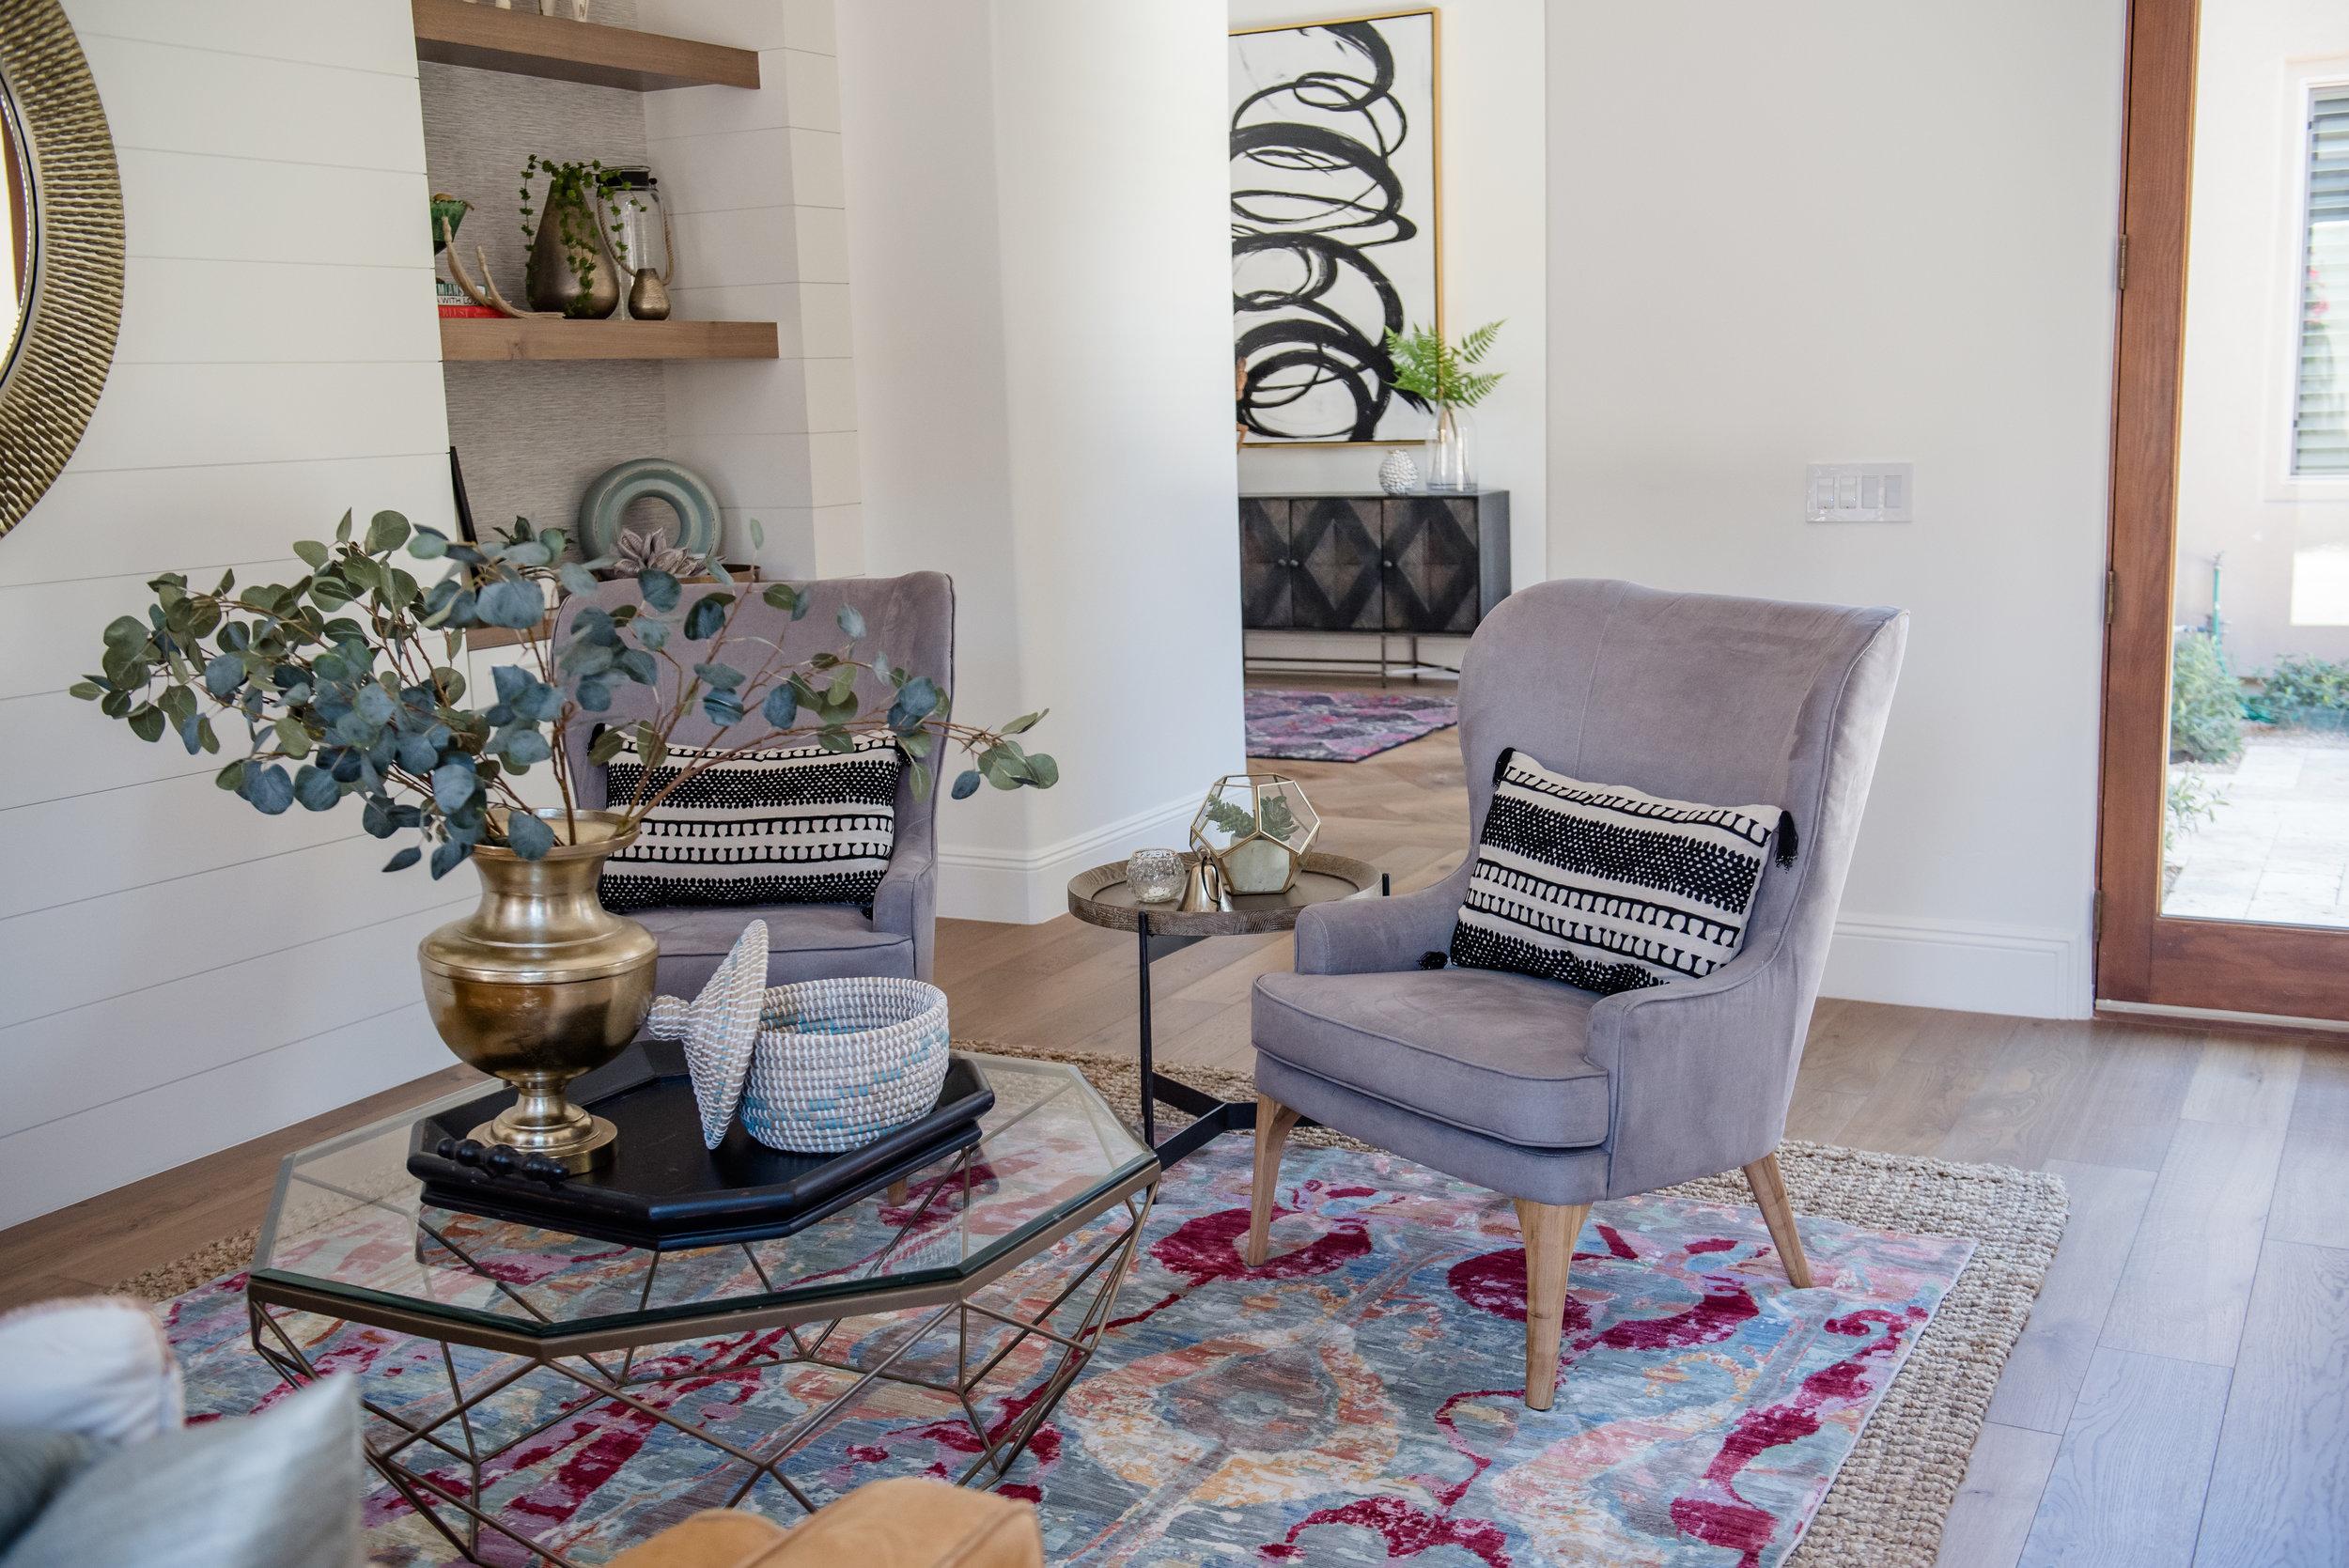 7+LivingRoom+Boldrug+Ikat+Roundmirror+builtins+shiplap+graychairs+Leathersofa.jpg